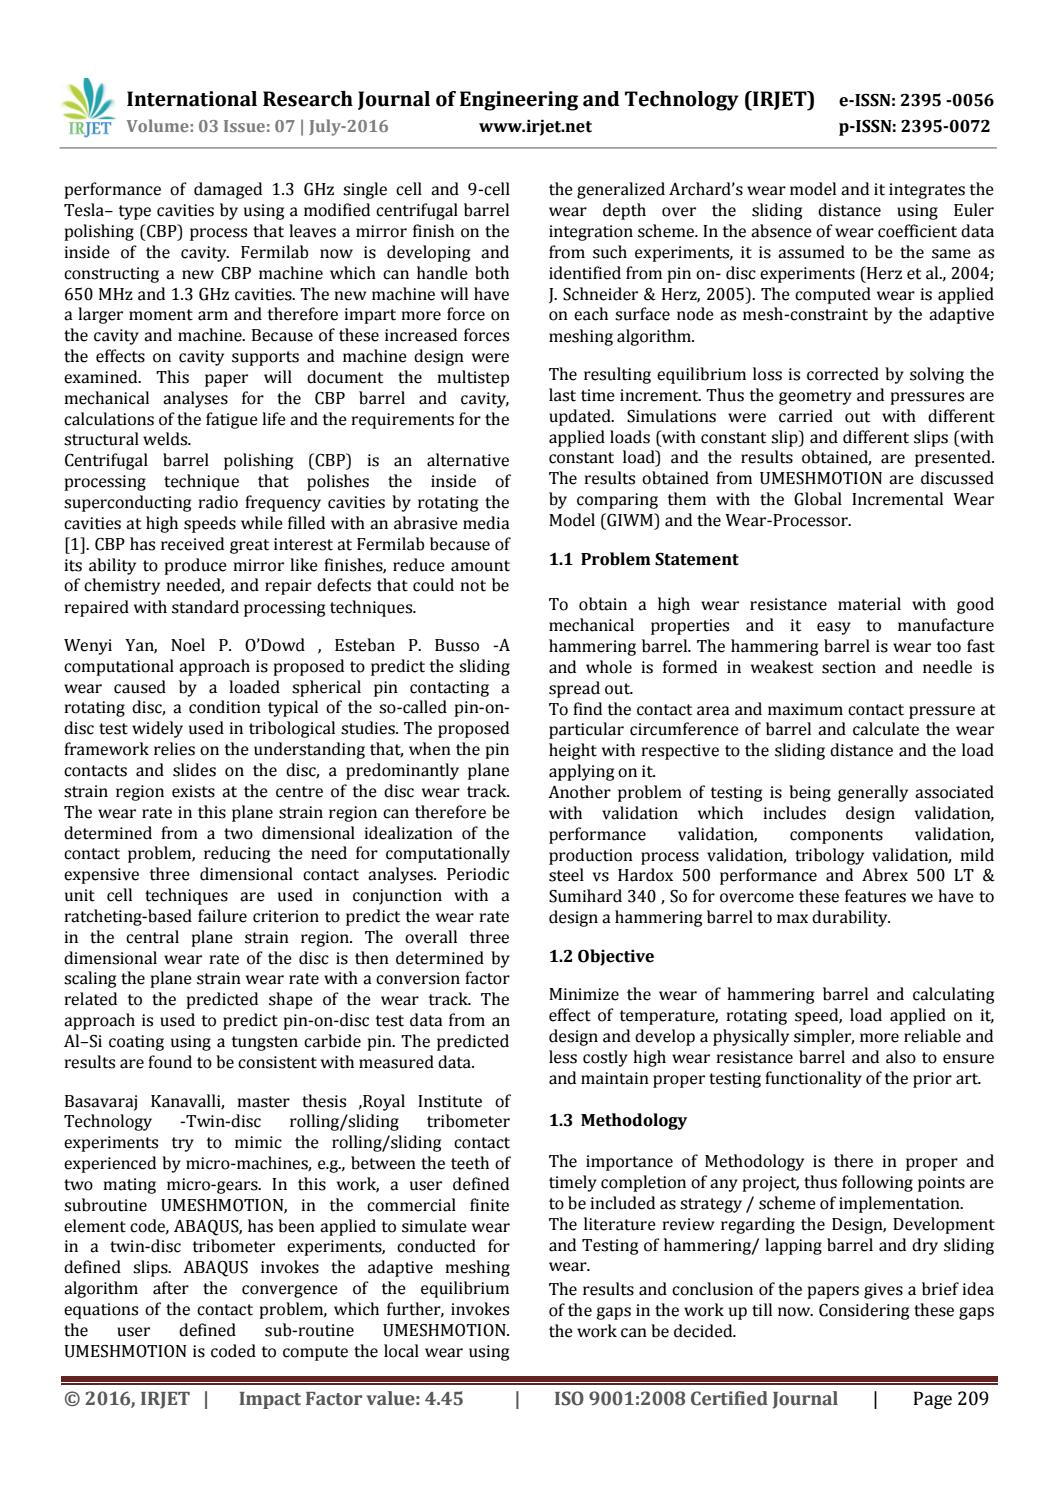 IRJET-Optimization of Hammering Barrel for Life Enhancement by Wear